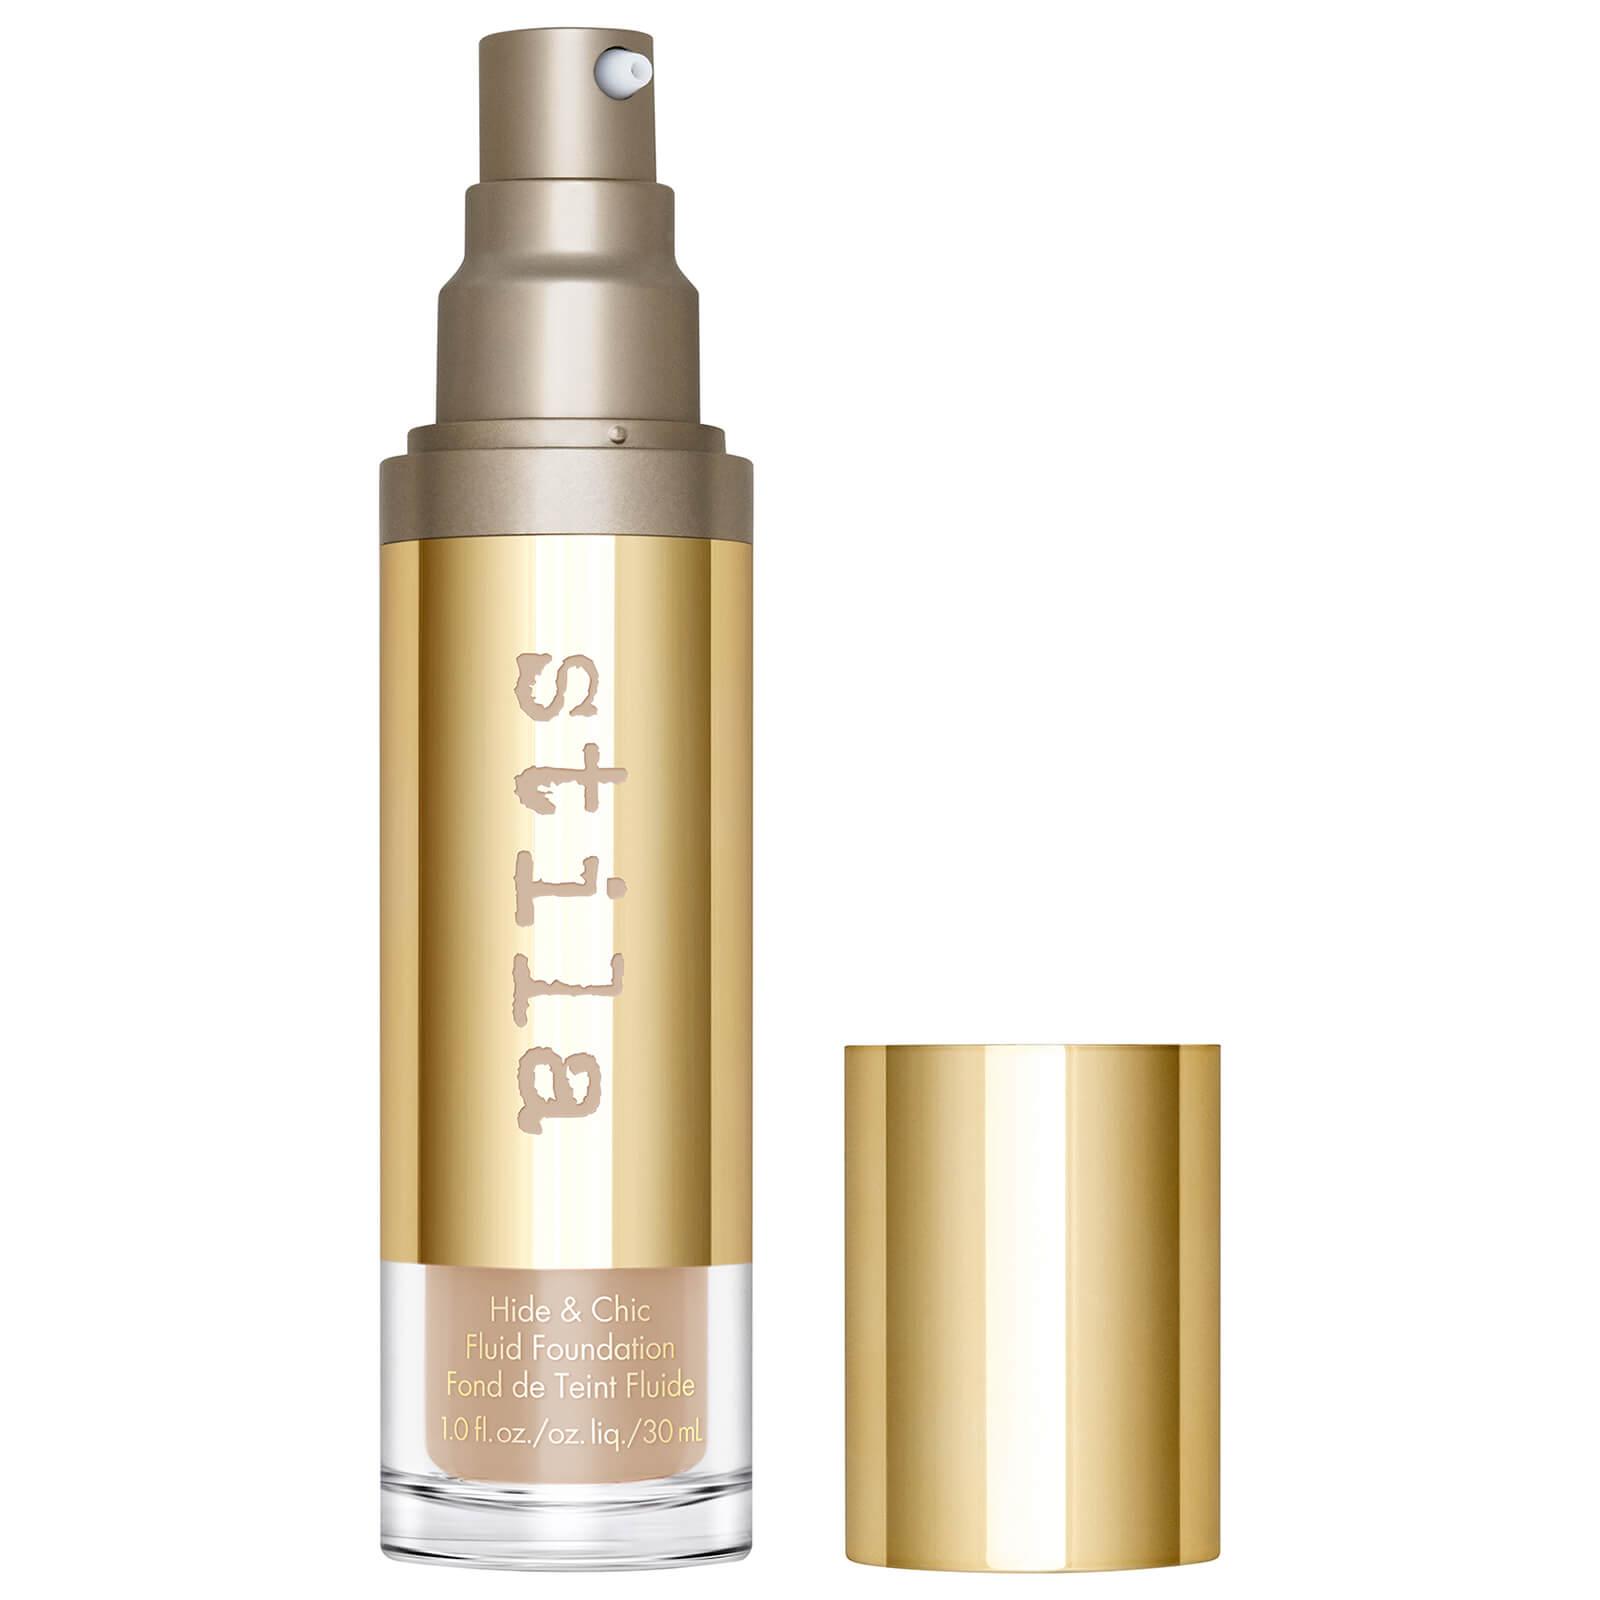 Stila Hide and Chic Fluid Foundation 30ml (Various Shades) - Medium 3